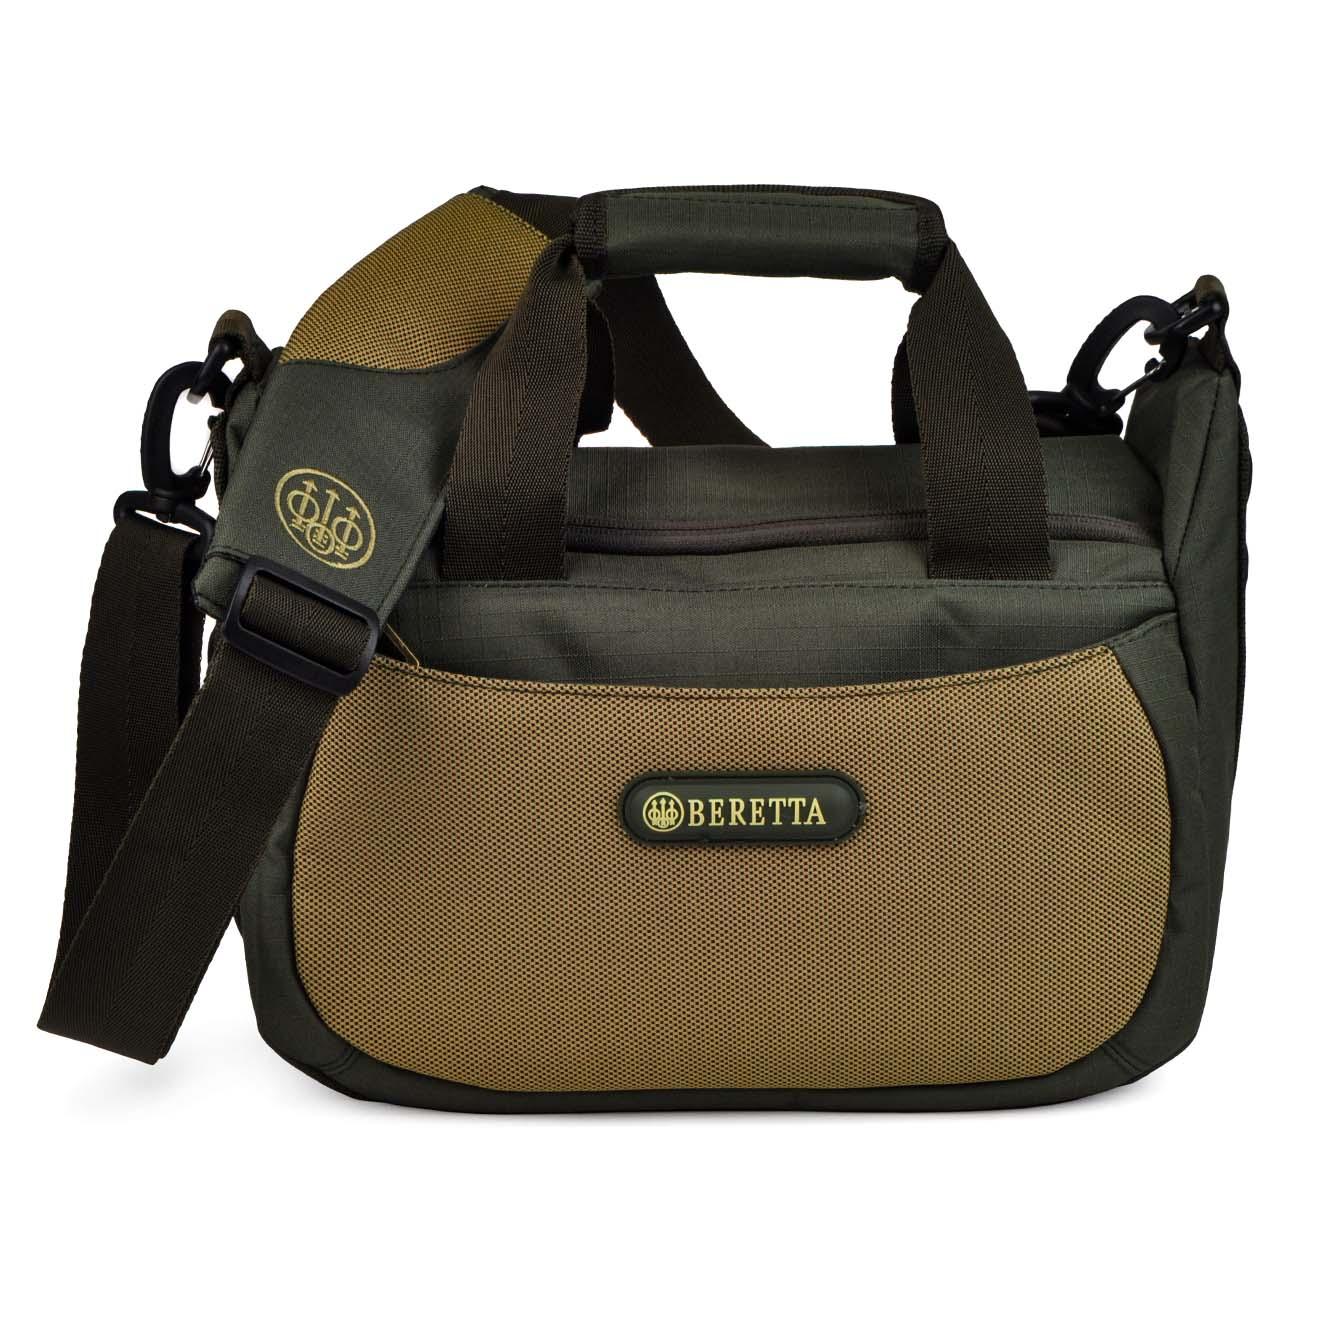 Beretta Retriever 100 Cartridge Bag Green   Light Brown - The ...